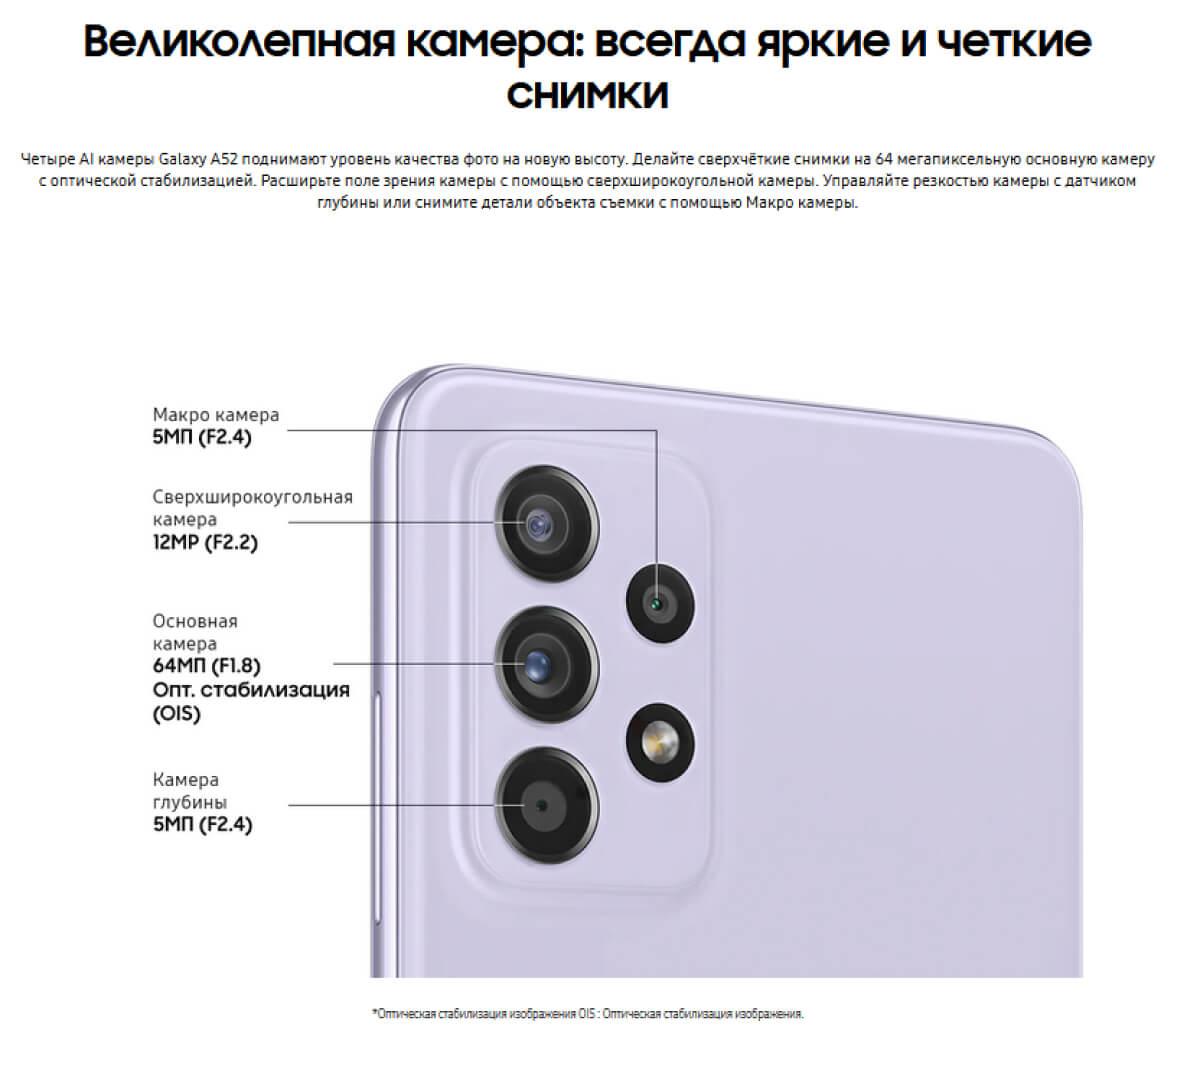 Samsung Galaxy A52 4/128 GB Голубой купить